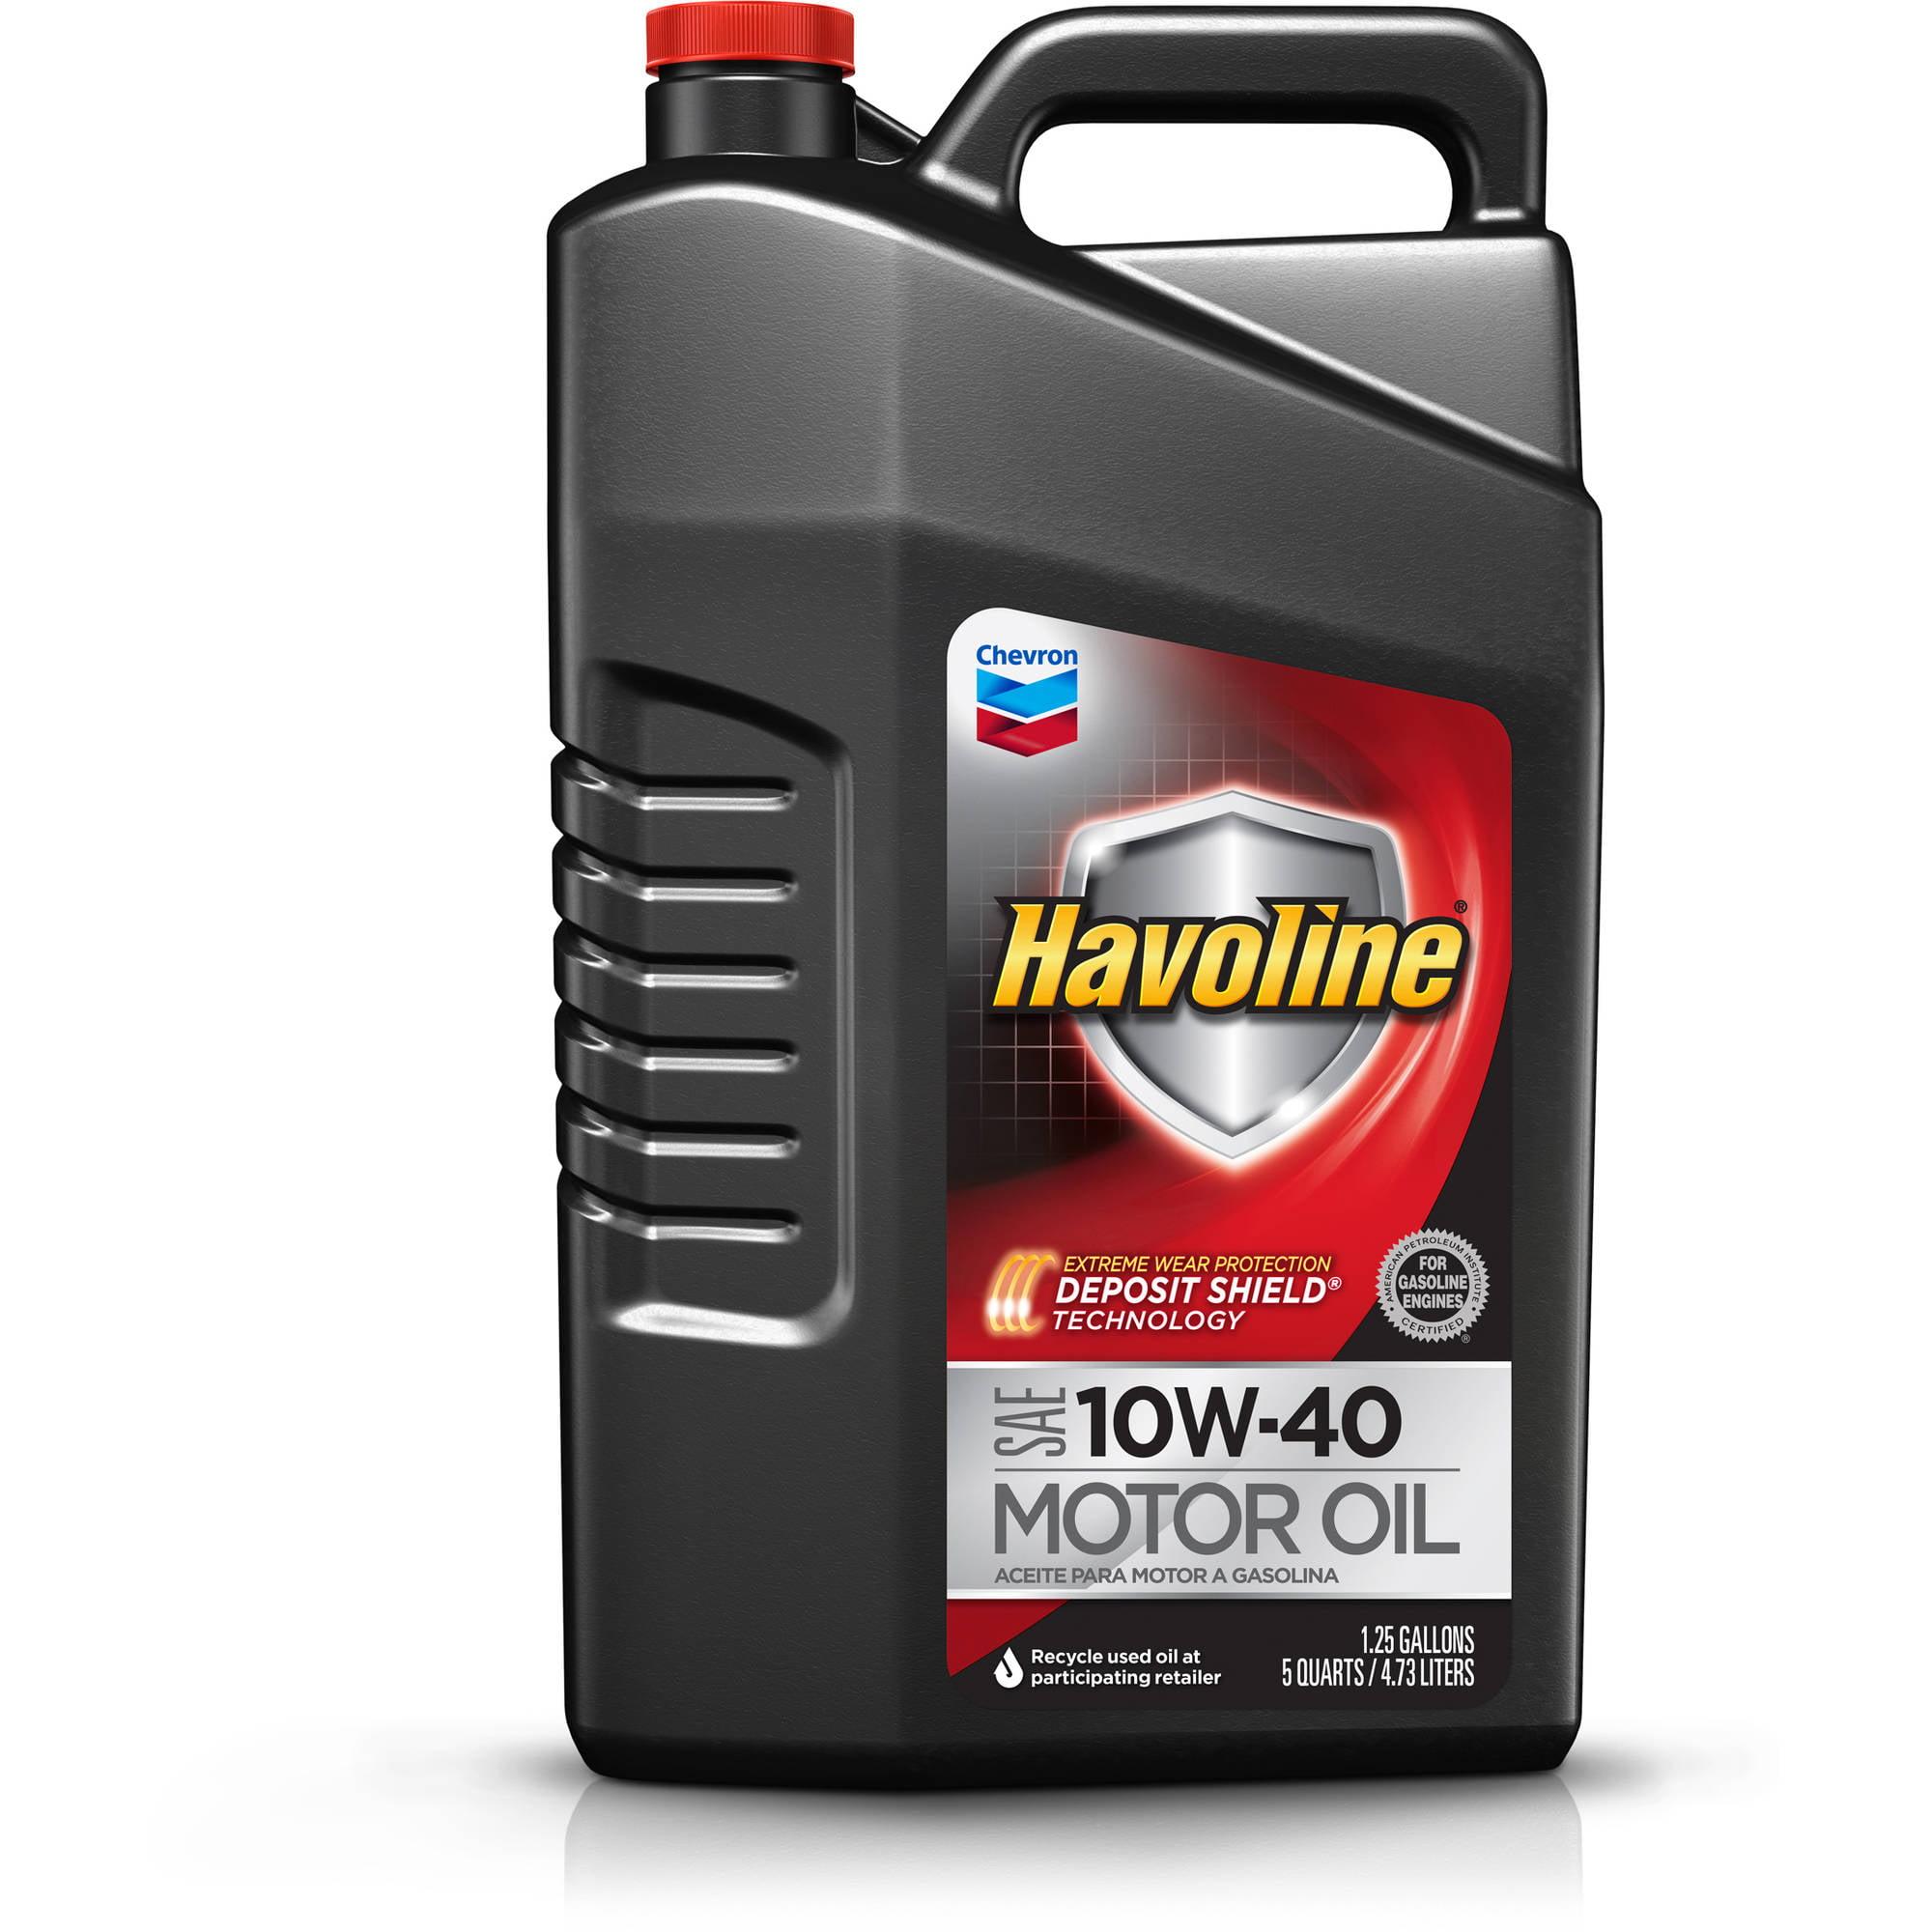 Havoline with Deposit Shield 10W40 Motor Oil, 5 qt - Walmart.com